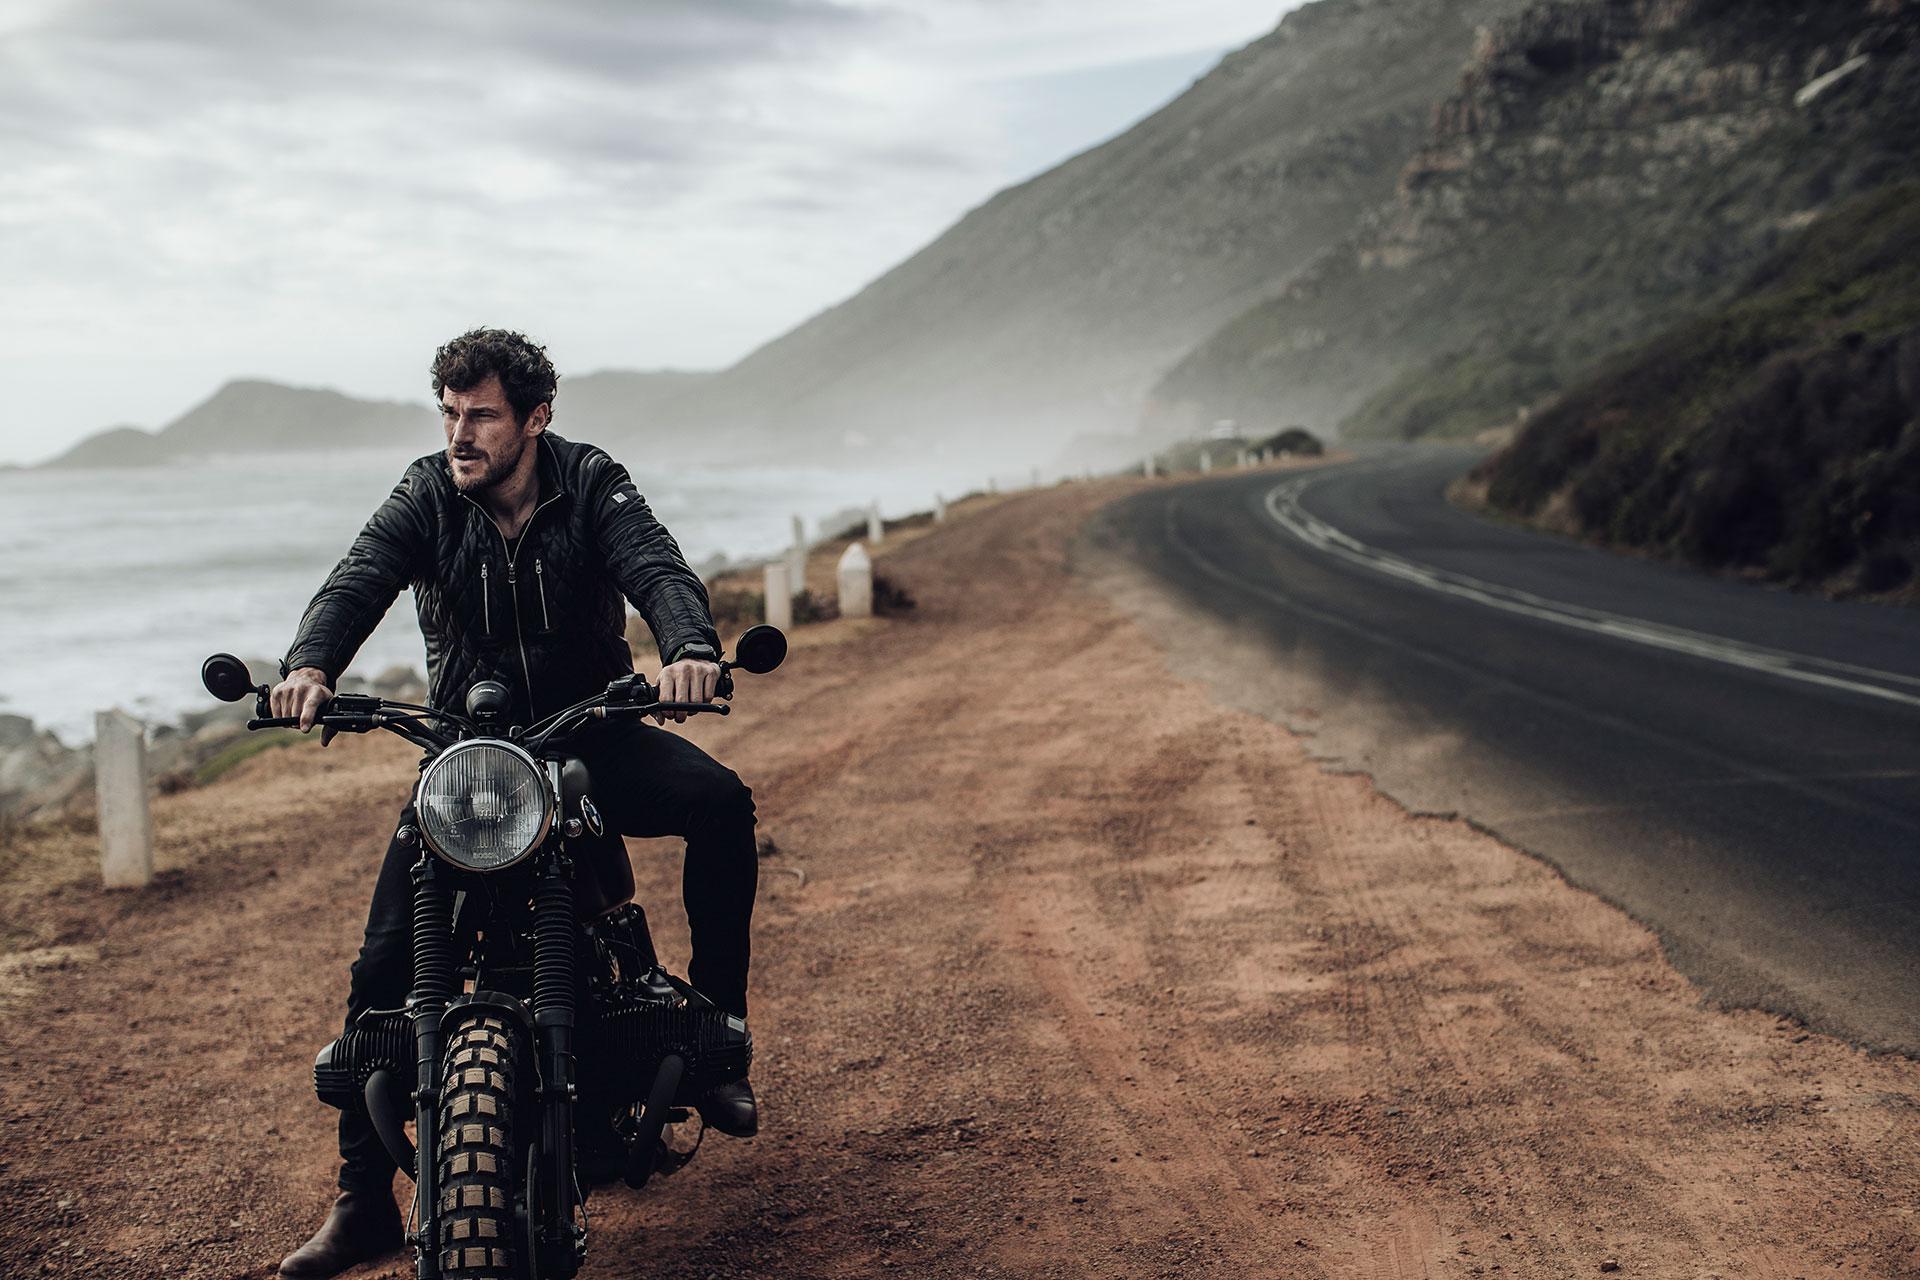 Biker Motorrad Fotograf Automotive Landscape Lifestyle Produktion Italien Rom